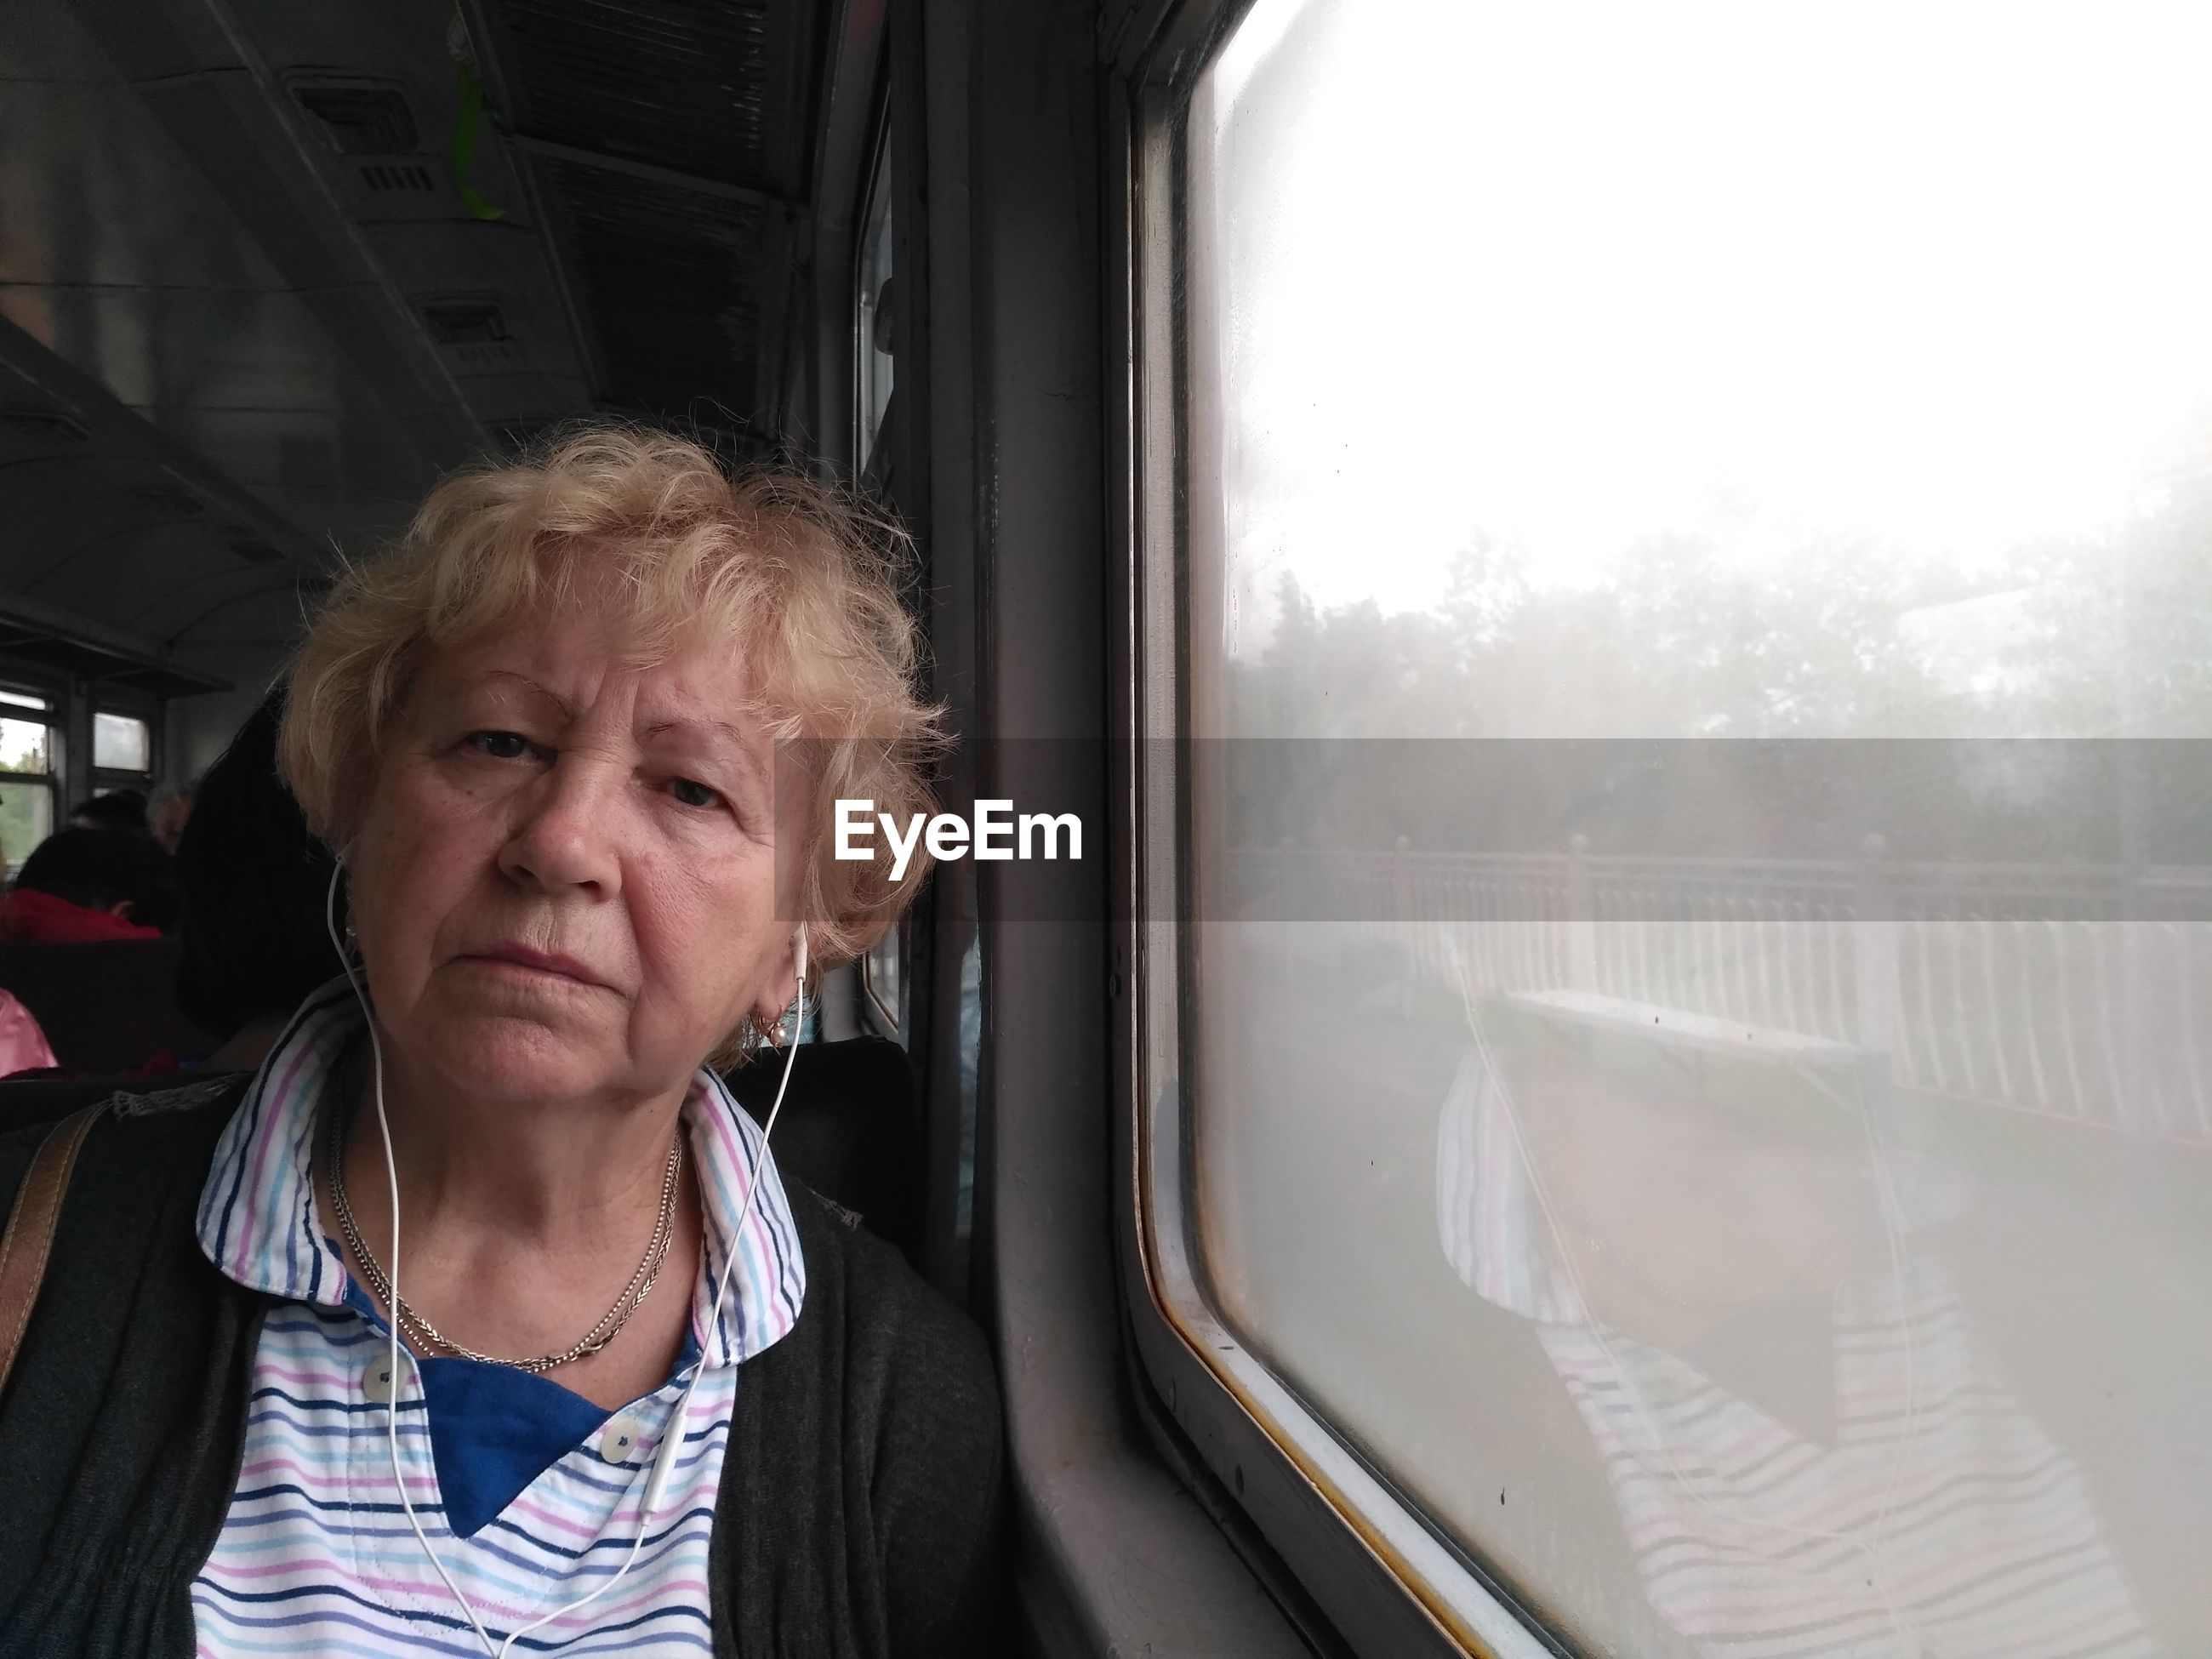 GIRL SITTING ON TRAIN WINDOW